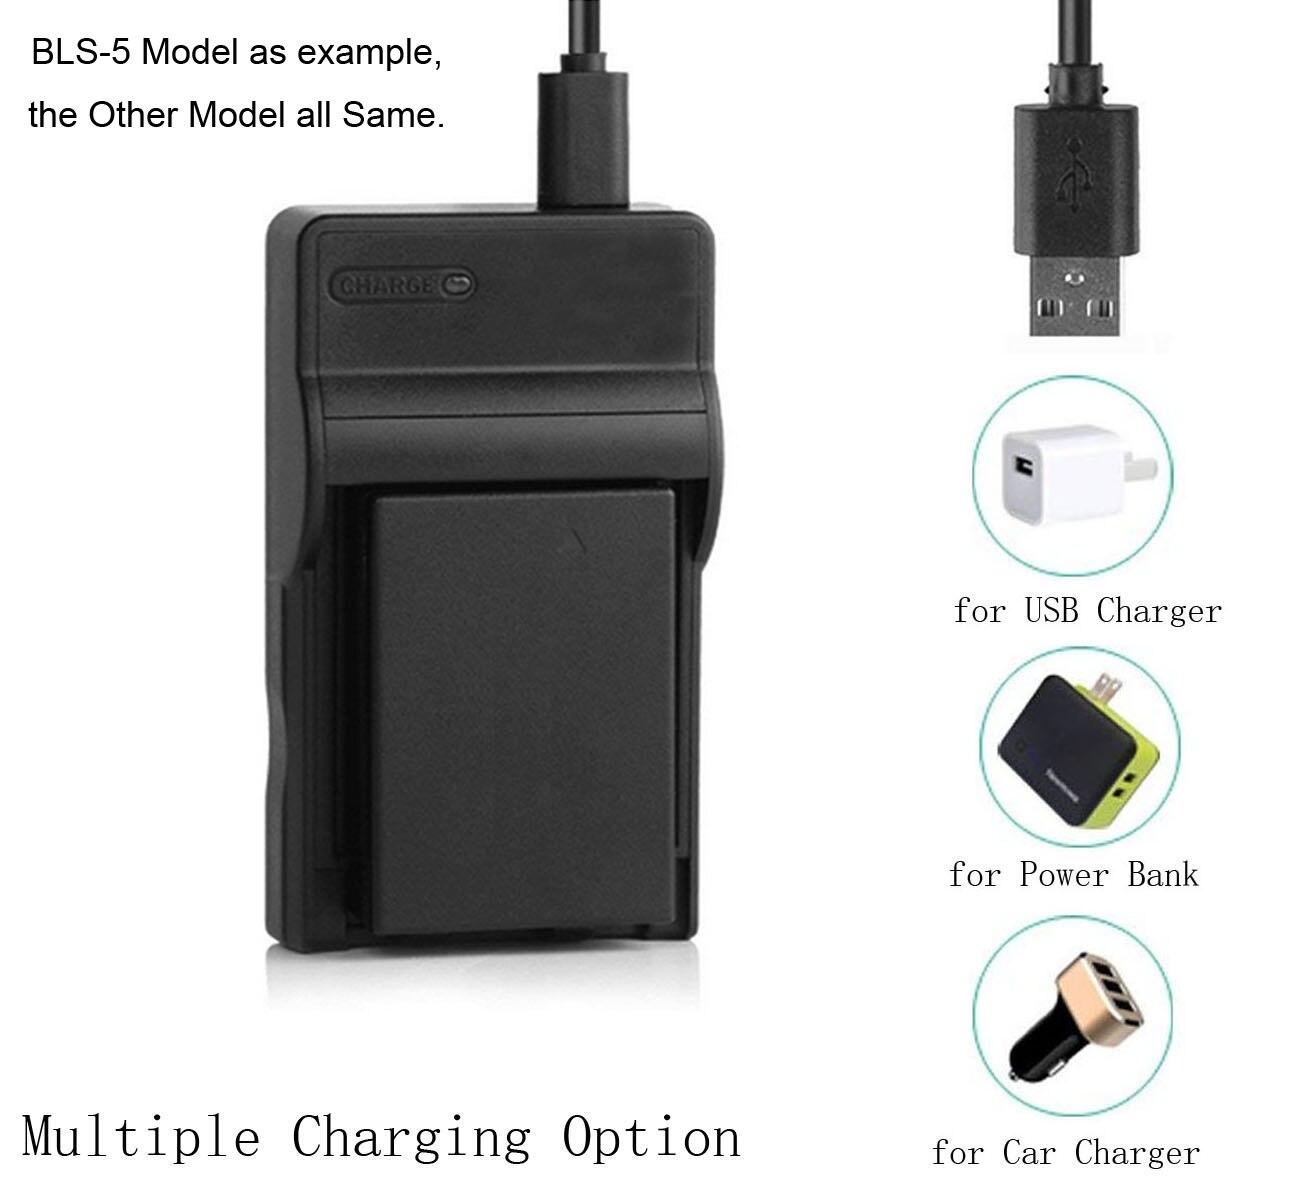 Li-40B 42B Battery Charger For Olympus TG-310 TG-320 VR-310 VR-320 VR-325 VR-330